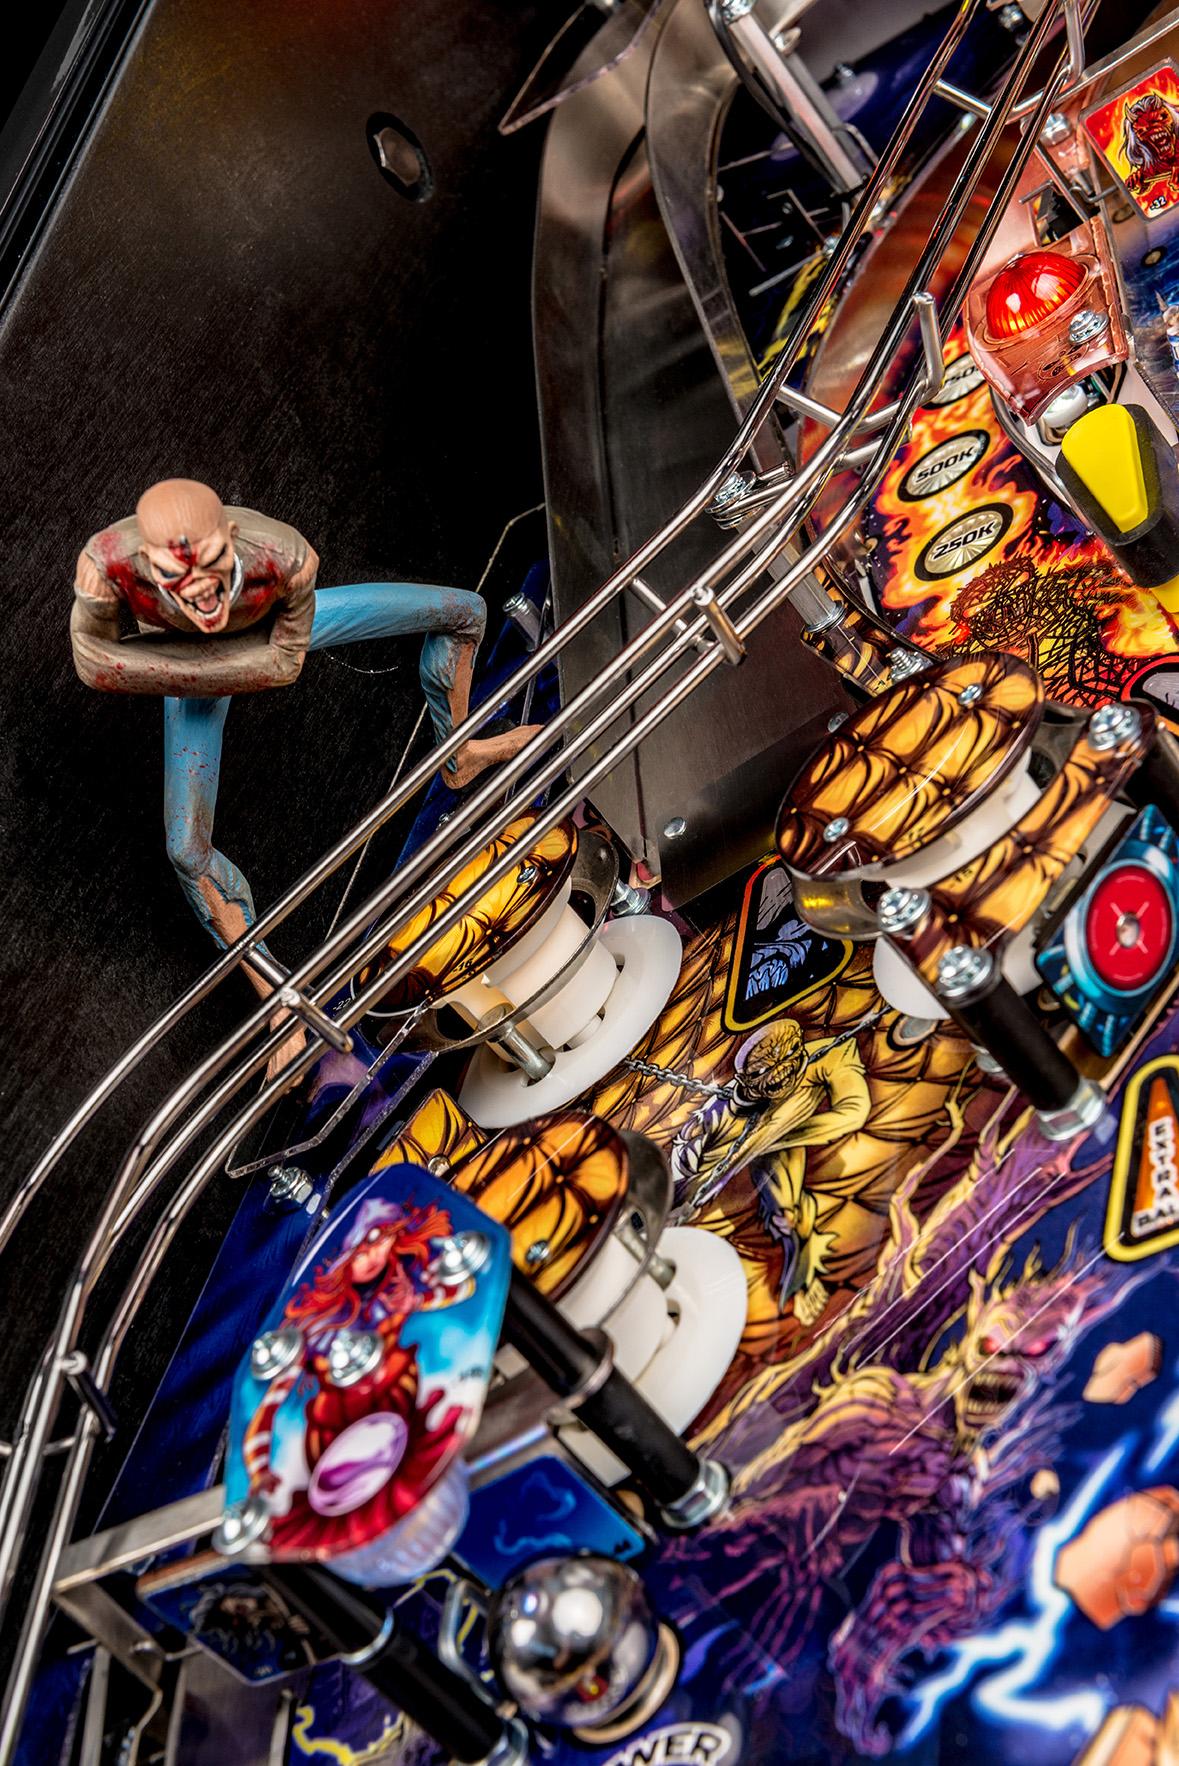 Iron-Maiden-Pinball-Machine-22a